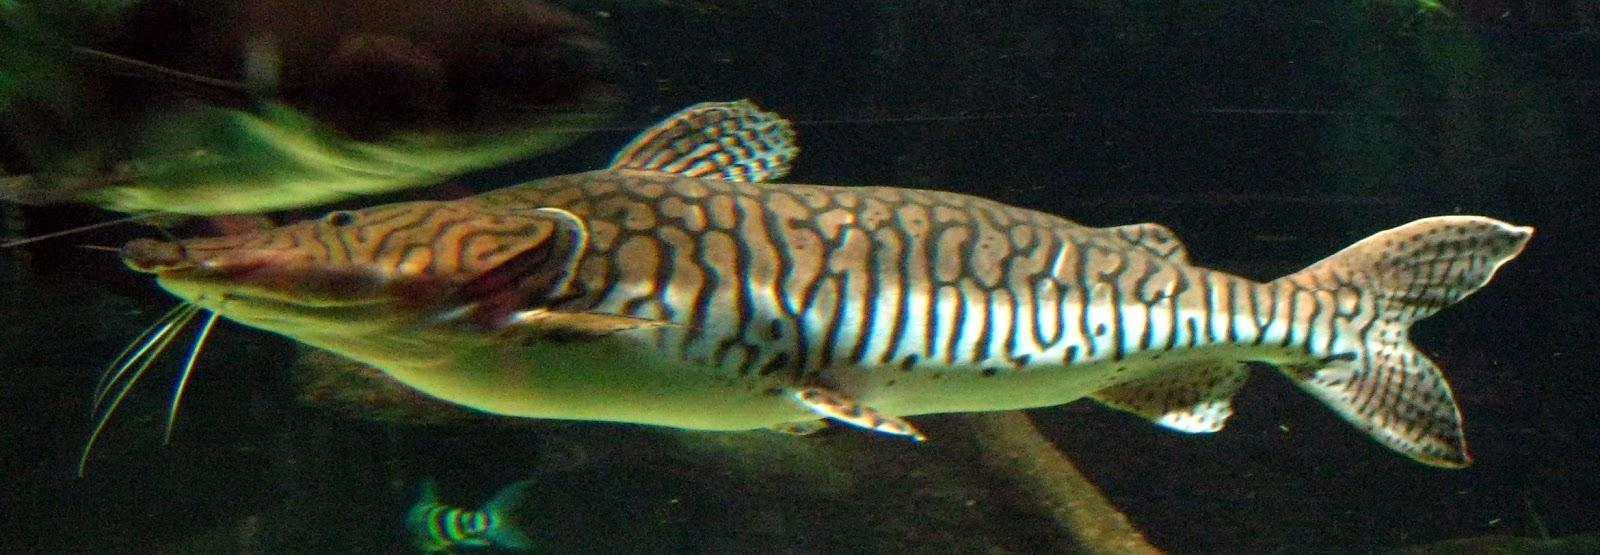 Peixe Pintado ou  Surubim (Pseudoplatystoma fasciatum)